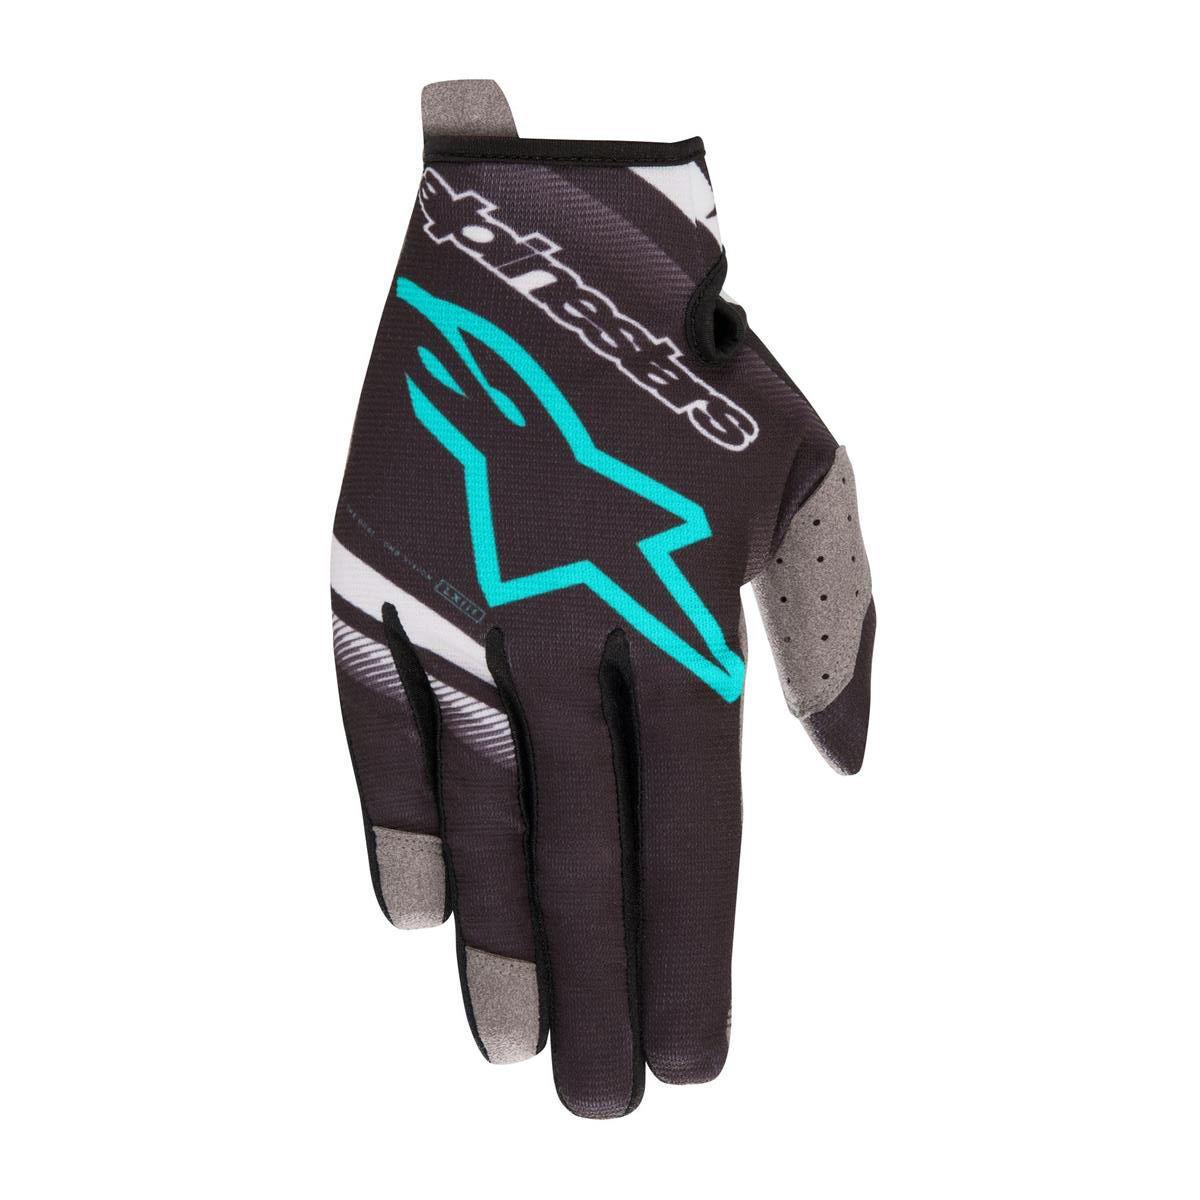 Alpinestars Handschuhe Radar Schwarz/Teal